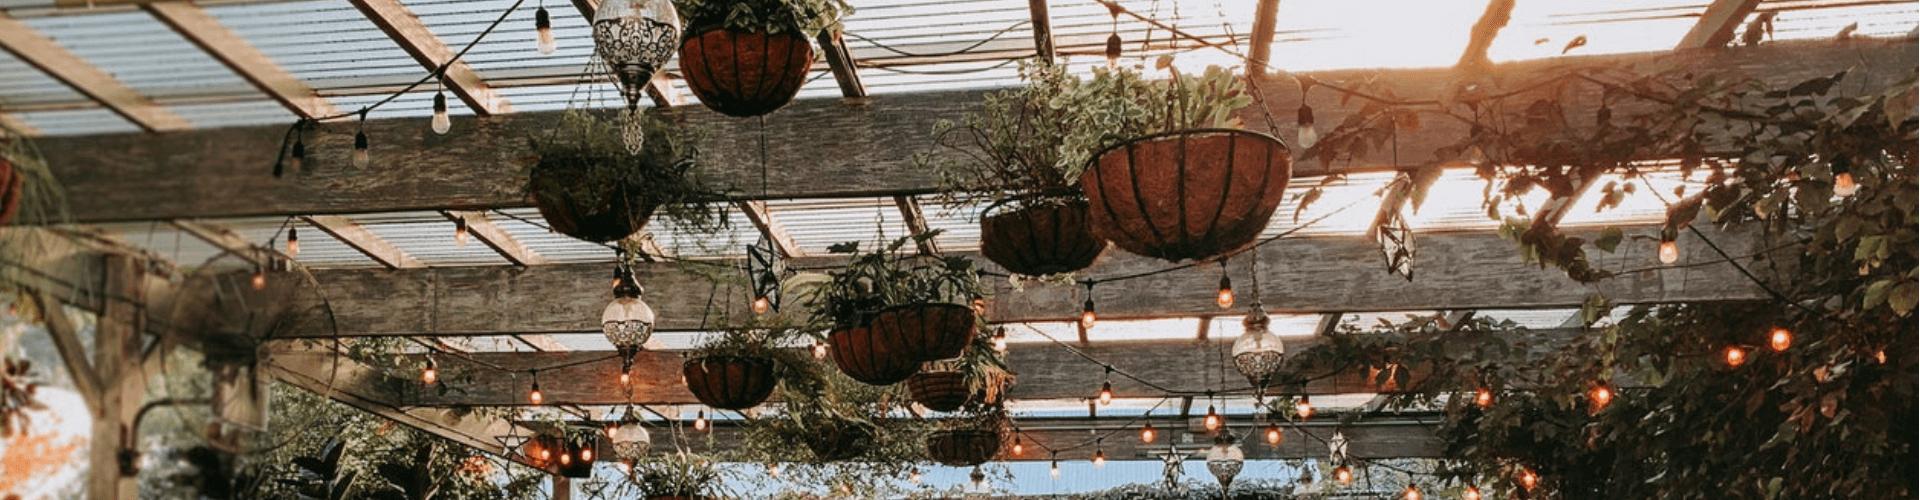 Garden Renovation in Winter